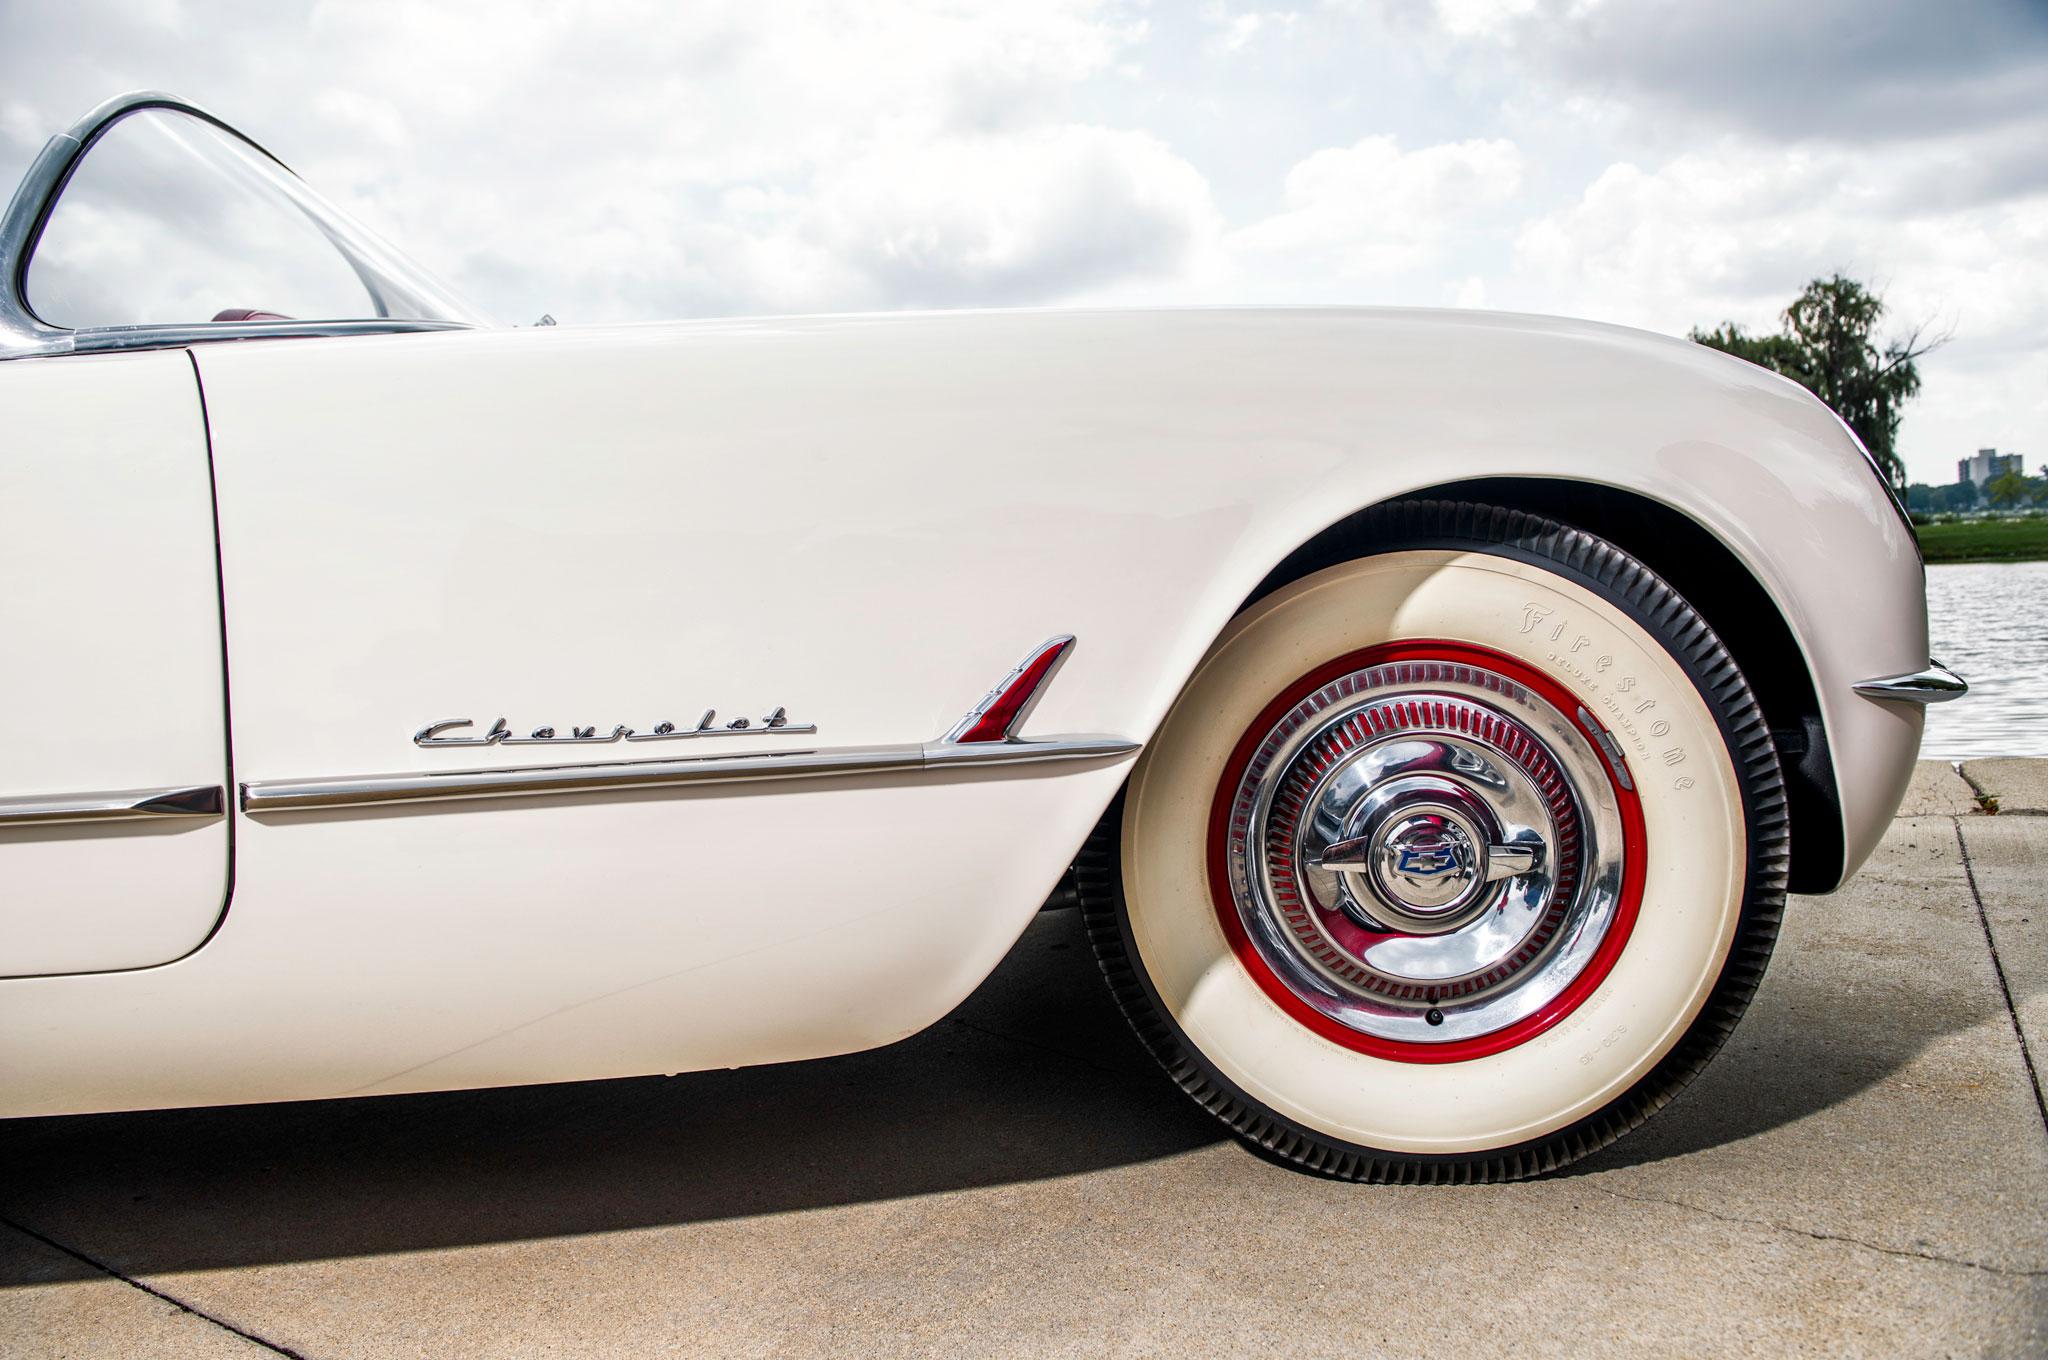 Then Vs Now 2015 Chevrolet Corvette 1954 Chevy Impala Lowrider Show More